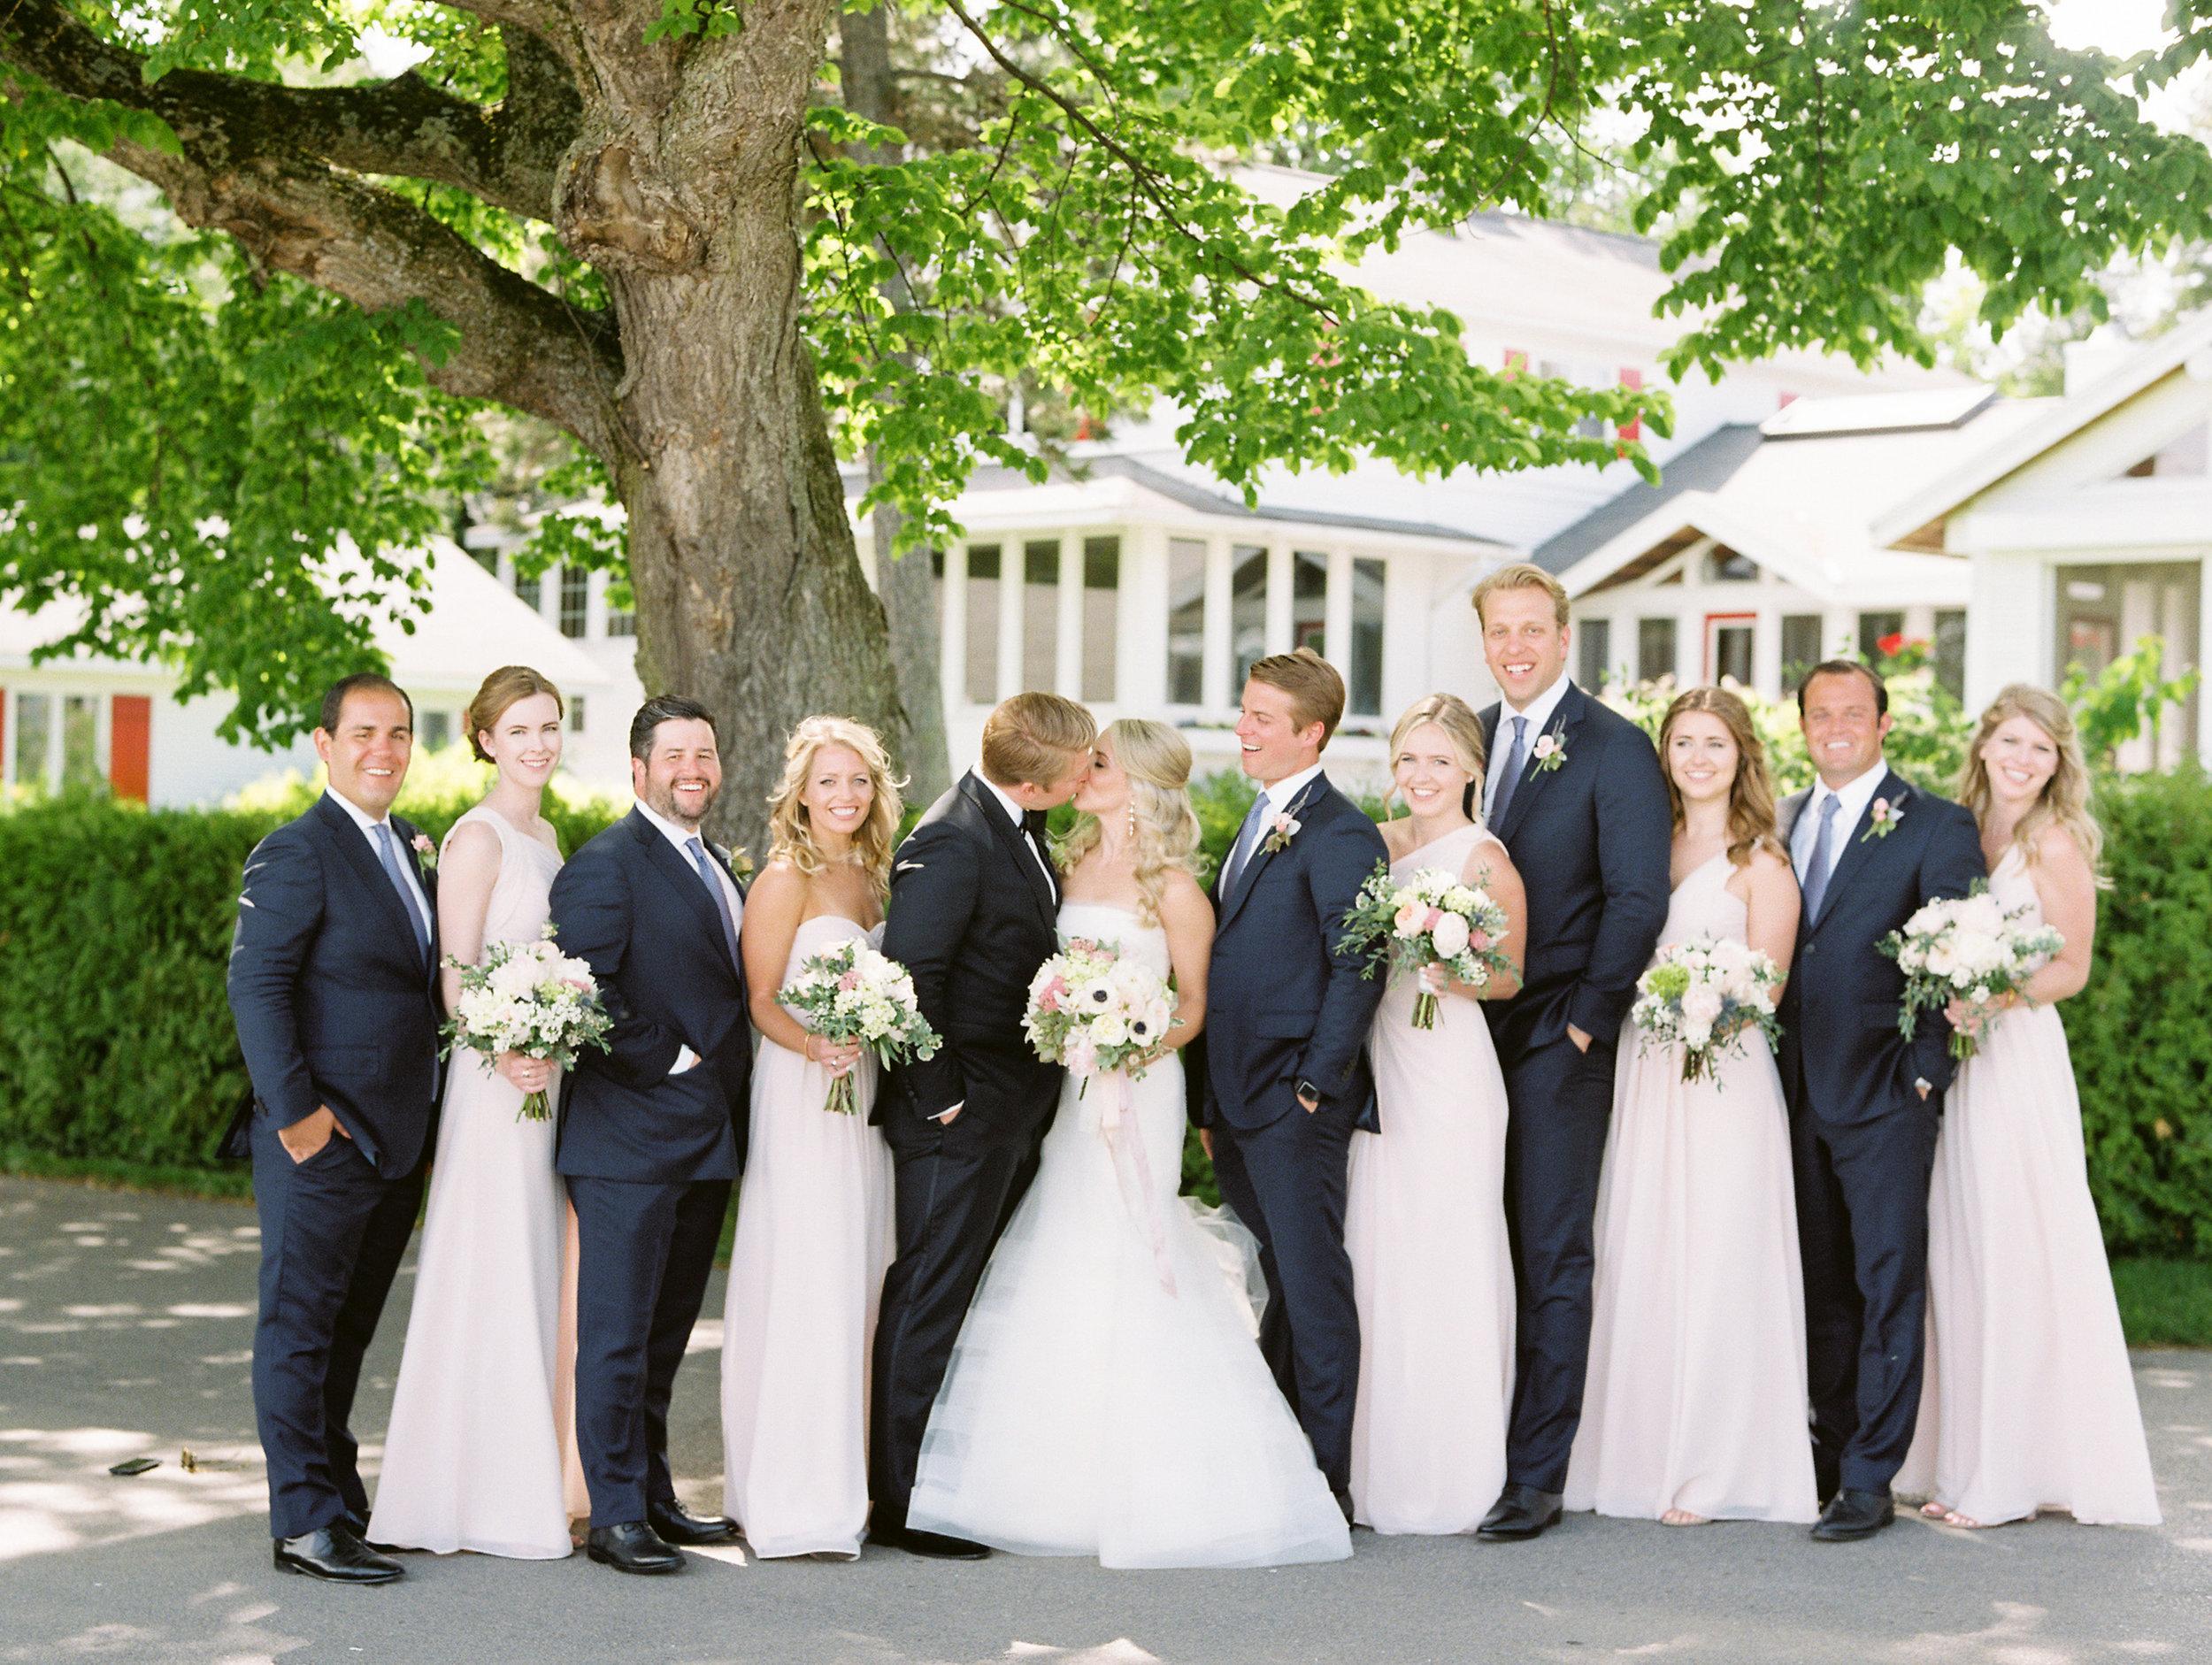 Coffman+Wedding+Bridal+Party-22.jpg